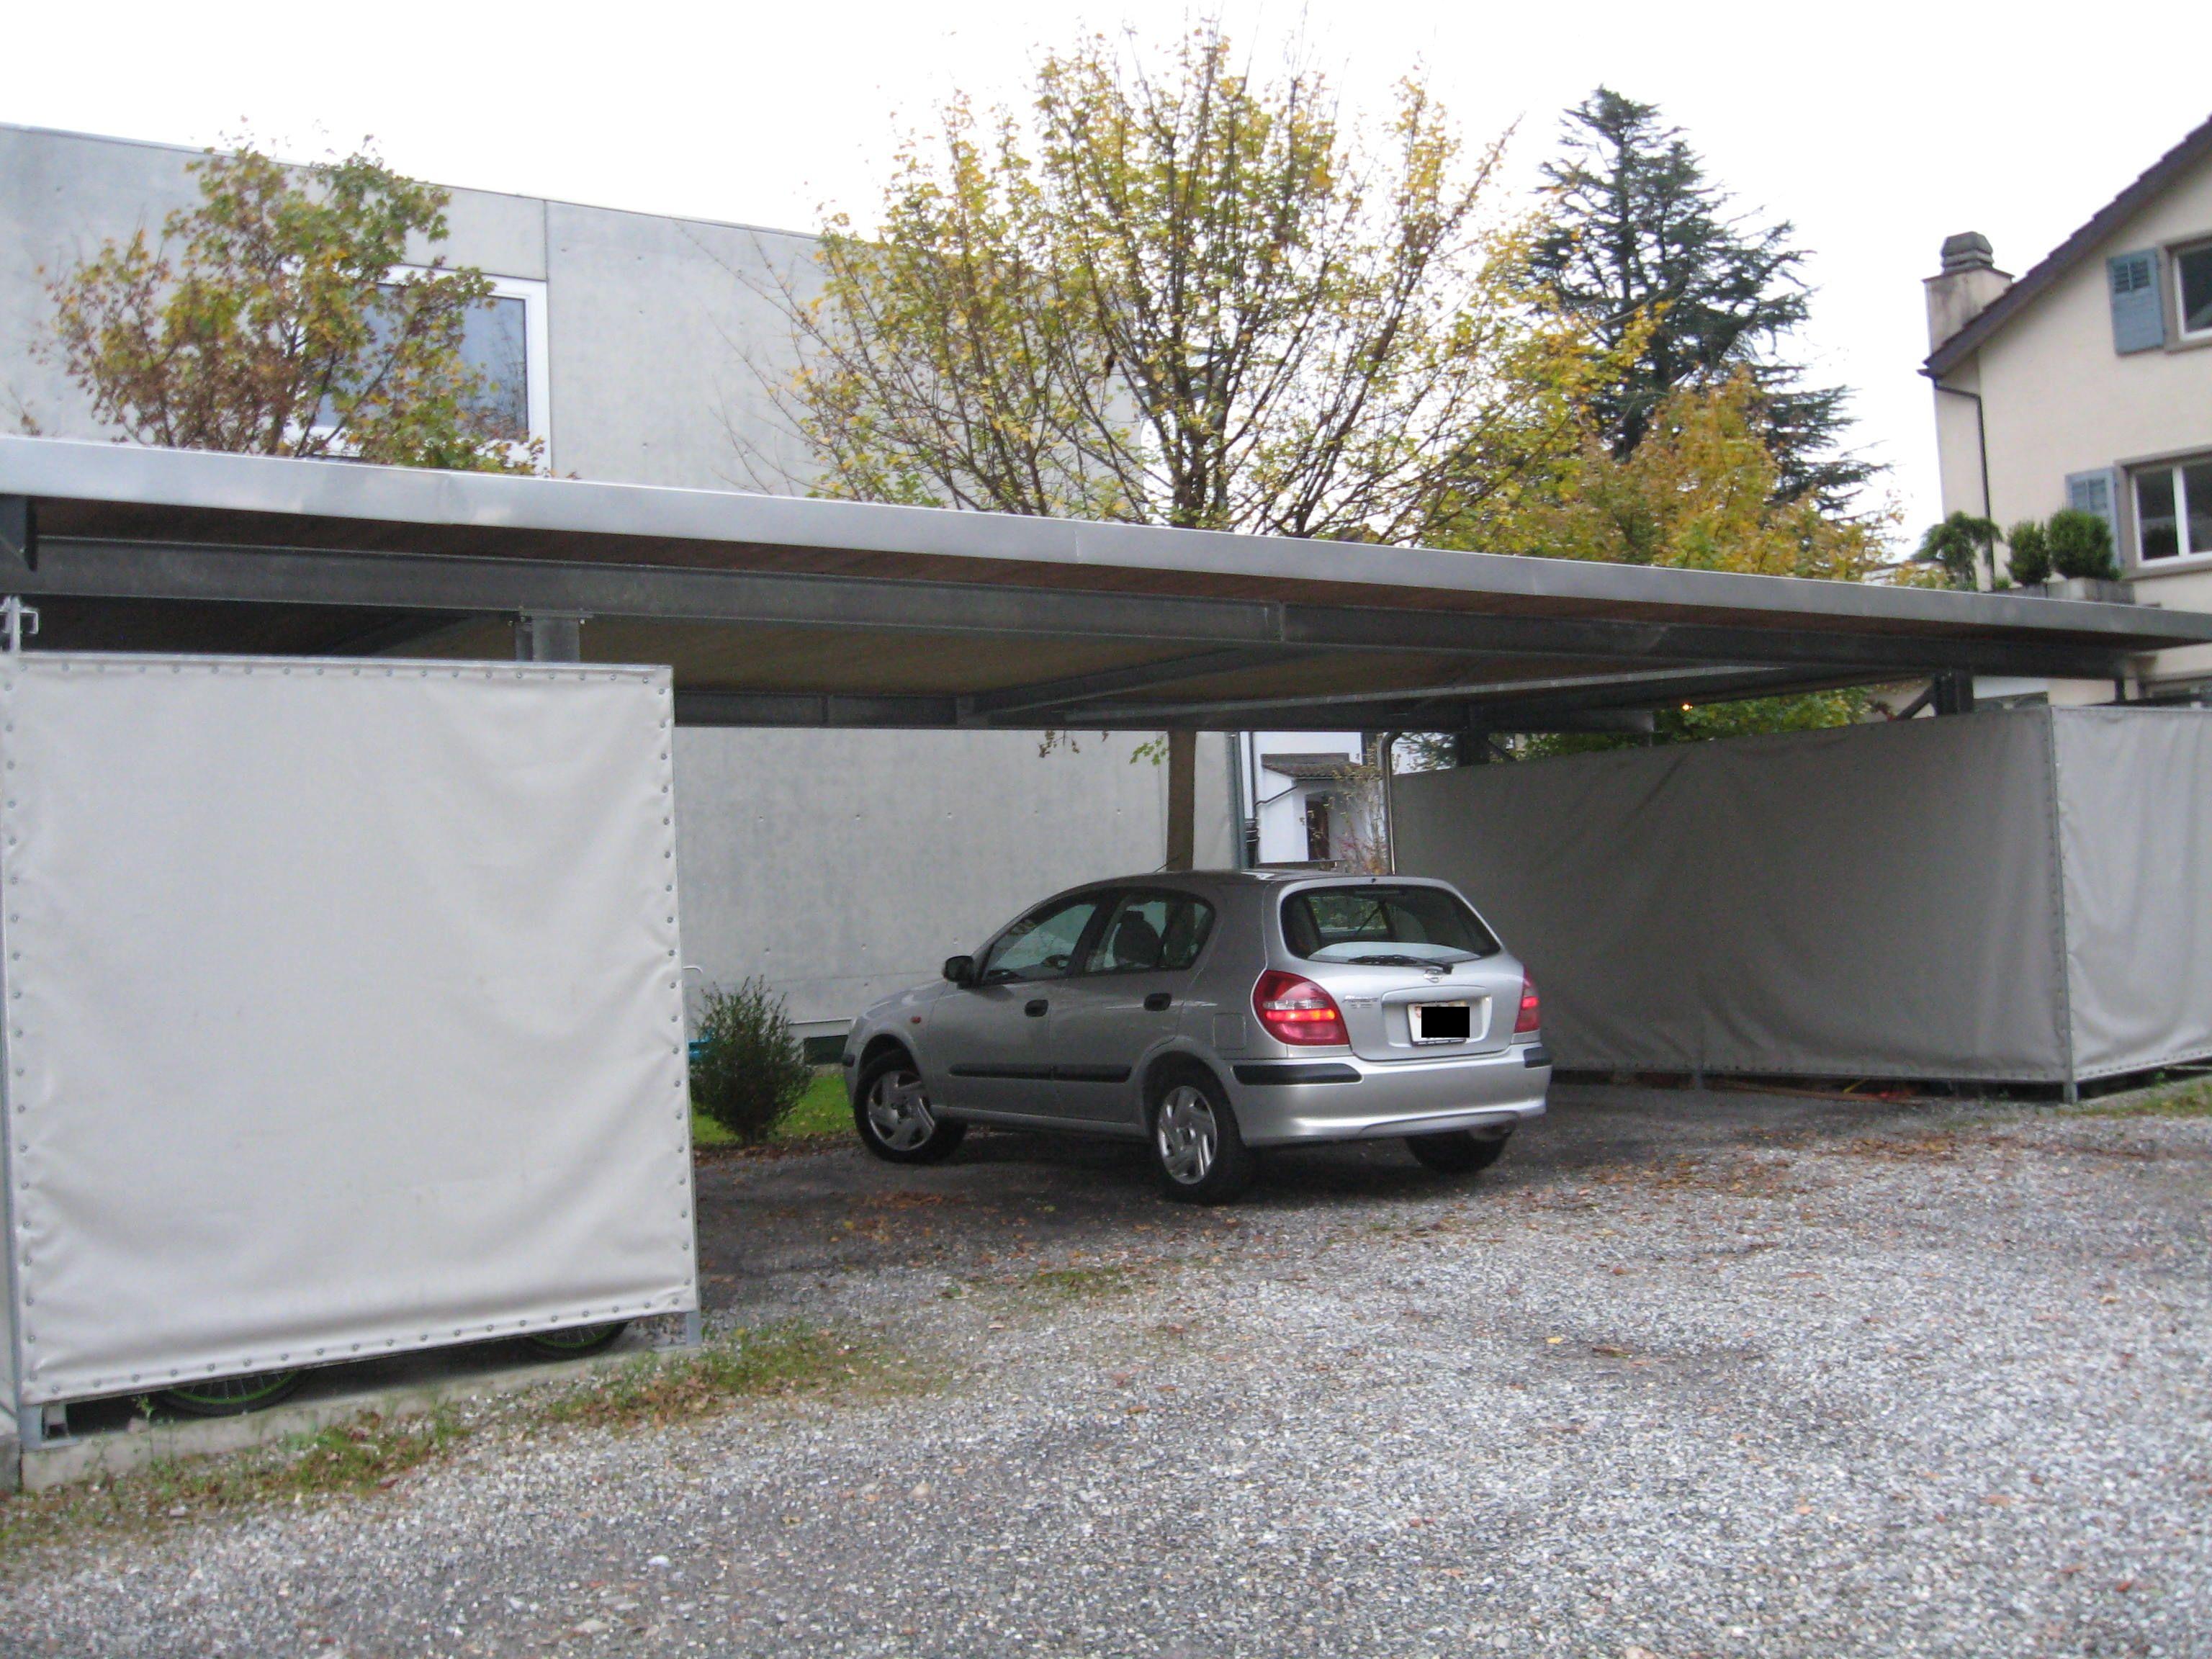 flachdach carport aus stahl mit 2 ger teschuppen f r 3. Black Bedroom Furniture Sets. Home Design Ideas